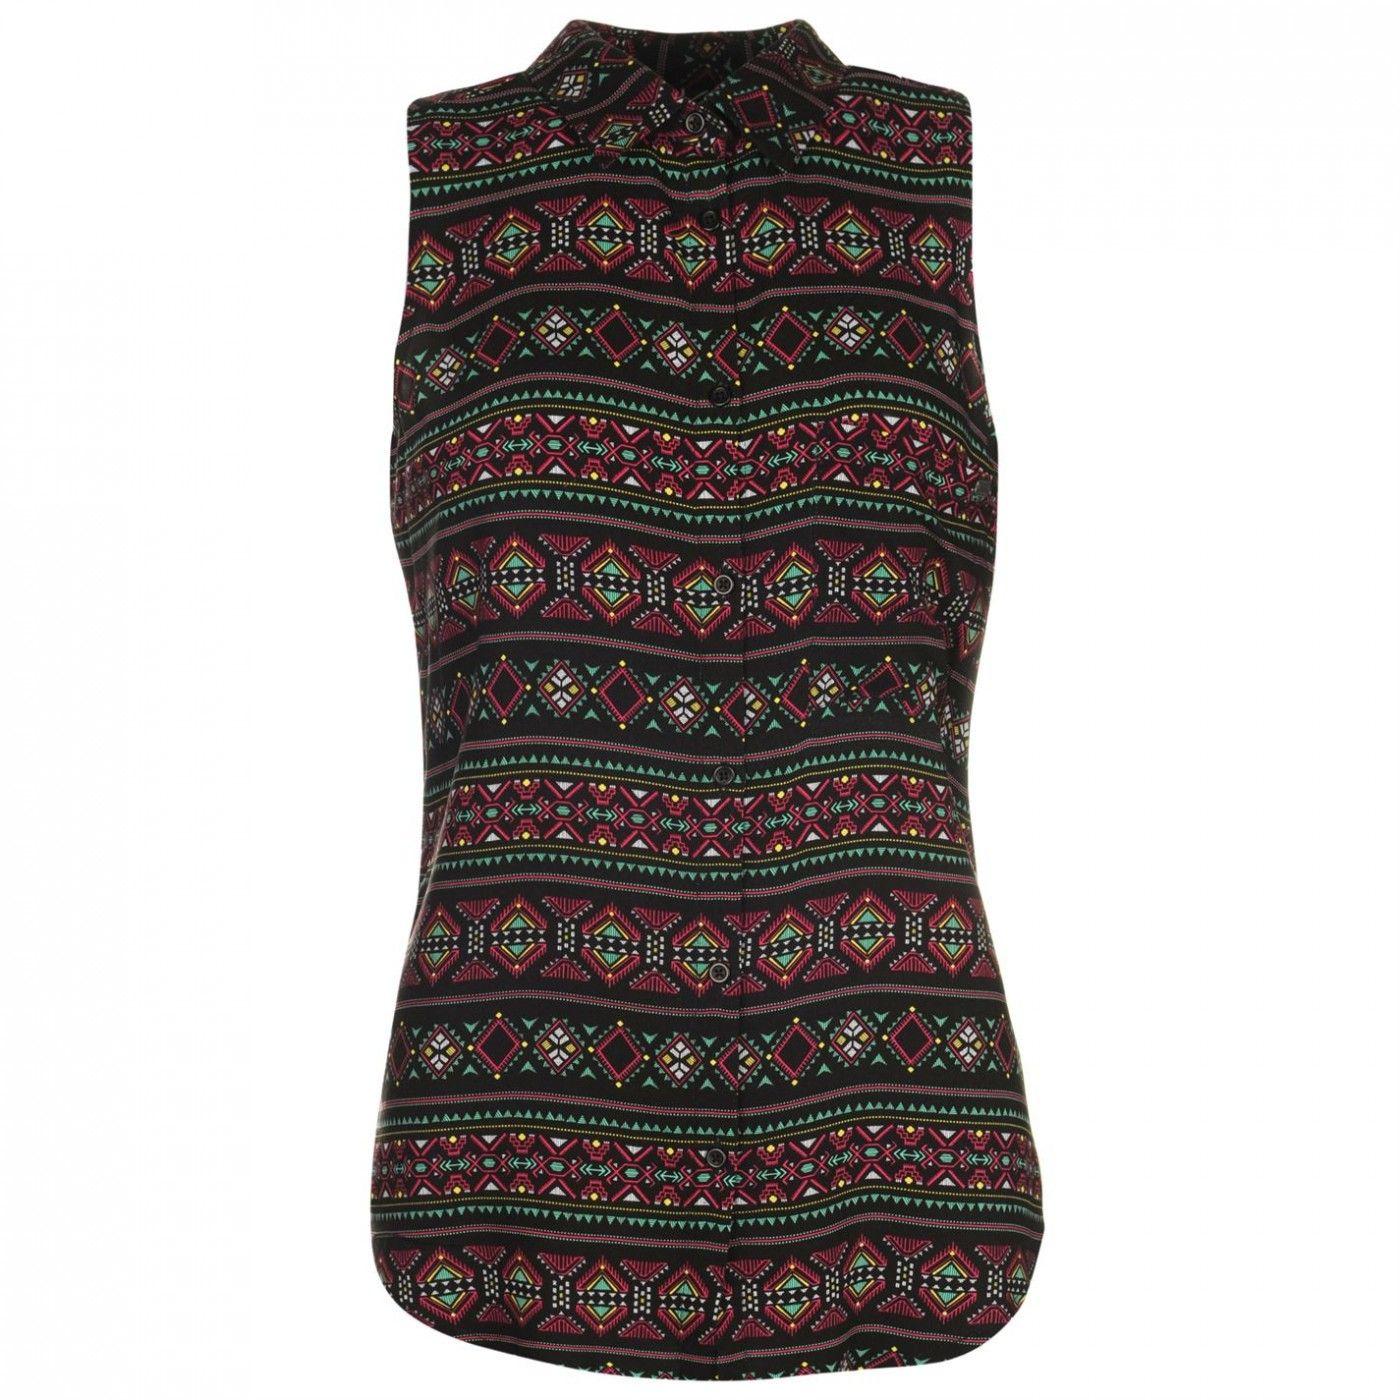 Lee Cooper - All Over Pattern Sleeveless Shirt Womens